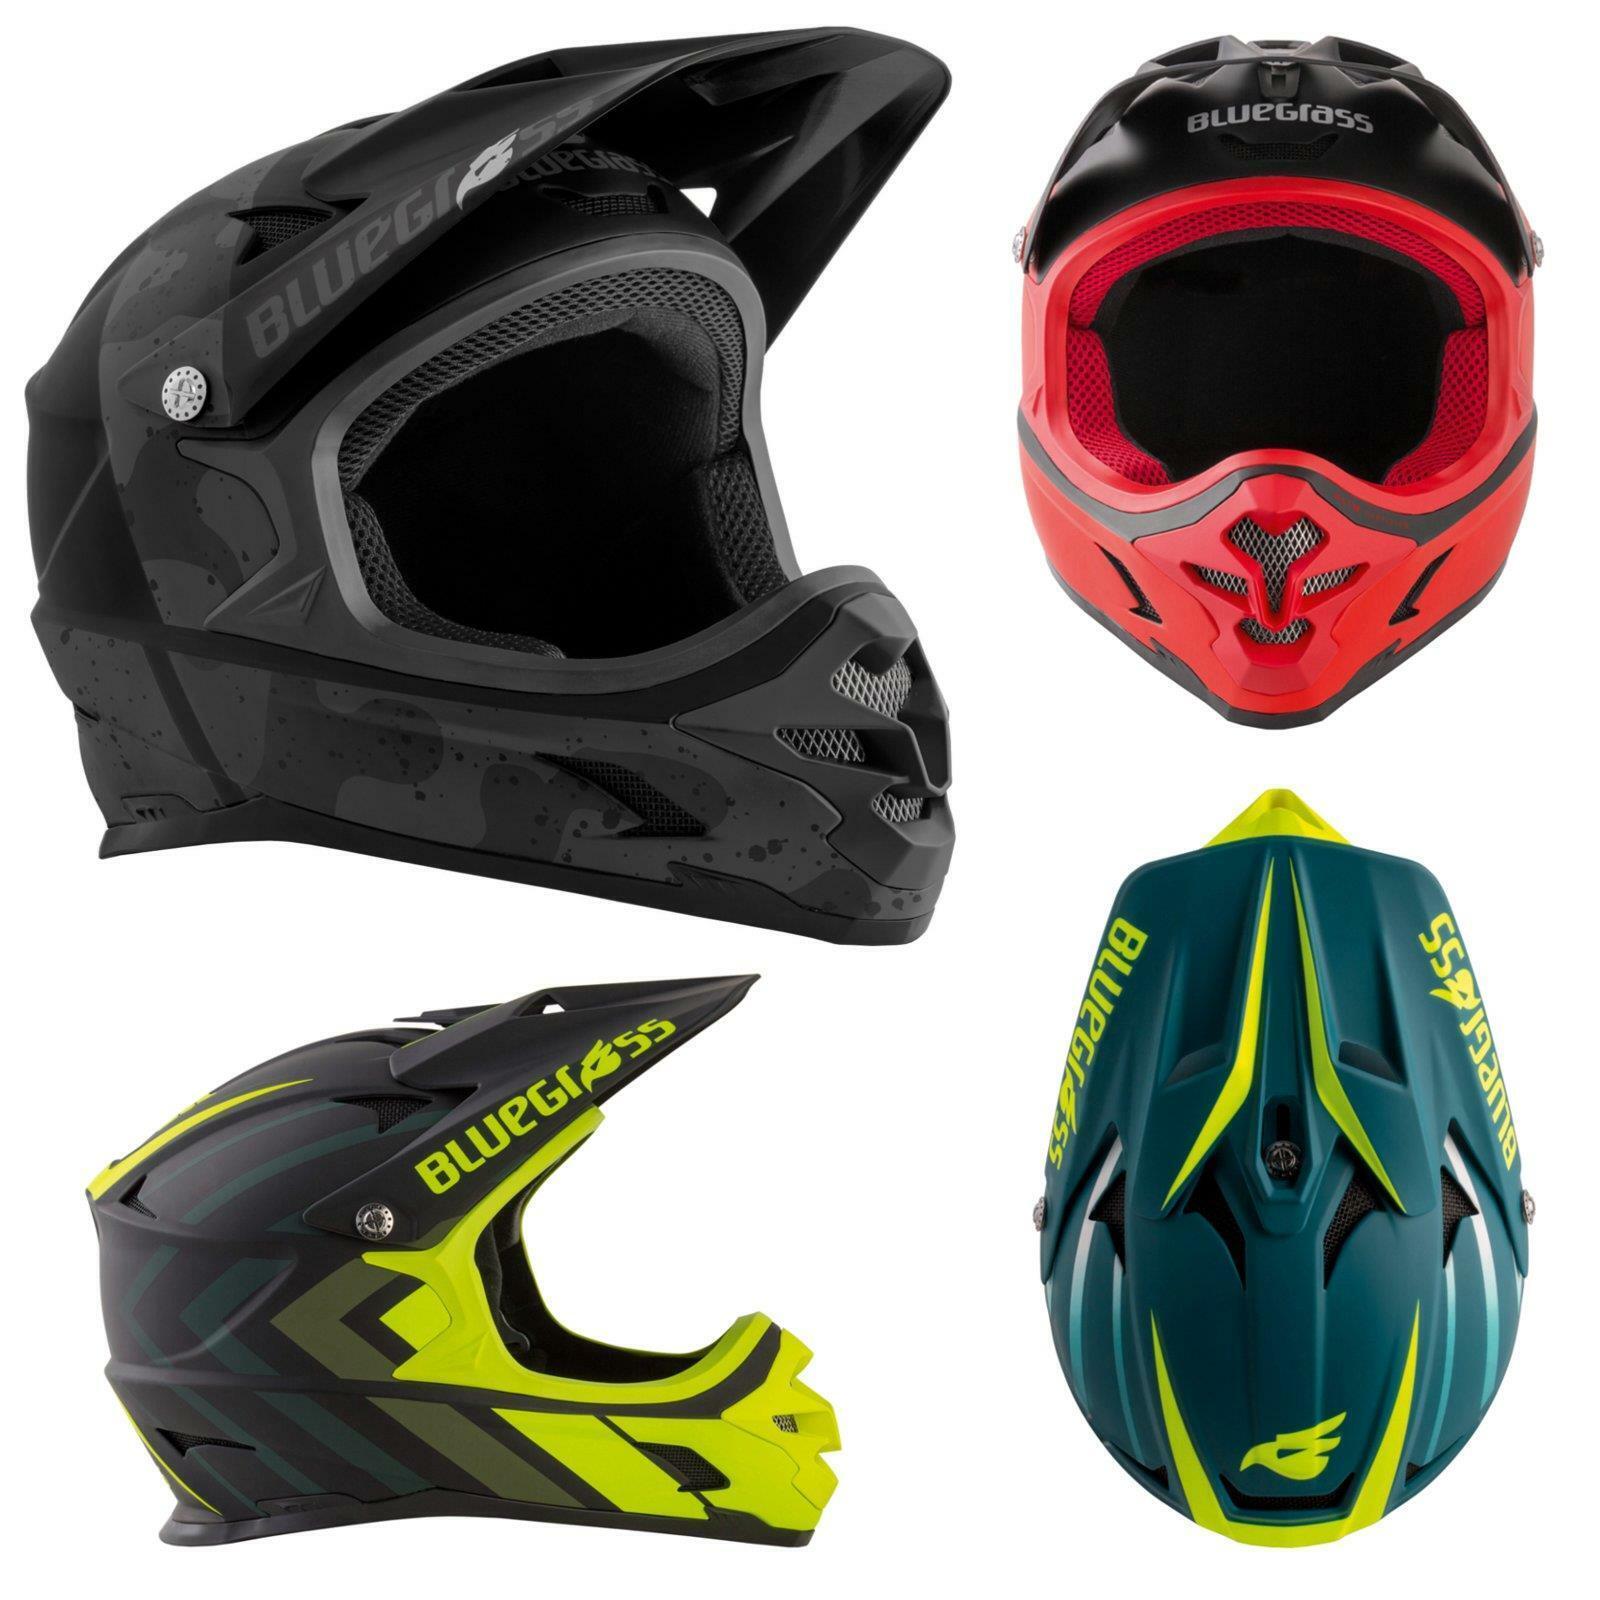 azulgrass Intox casco de bicicleta mountain bike downhill freeride FullFace MX MTB FR